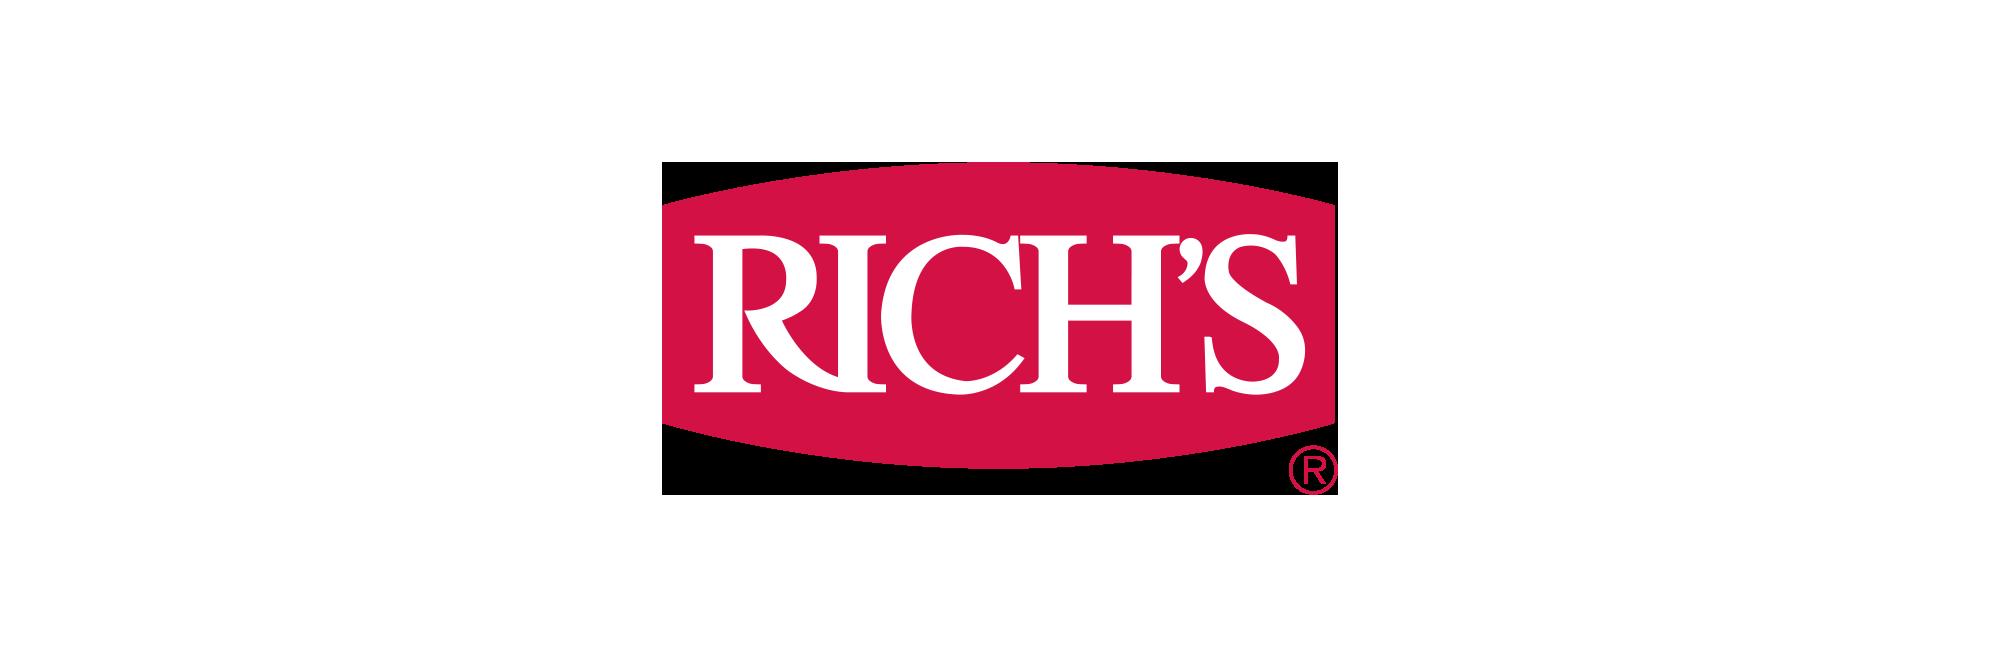 Rich's Cookie Dough Header Logo